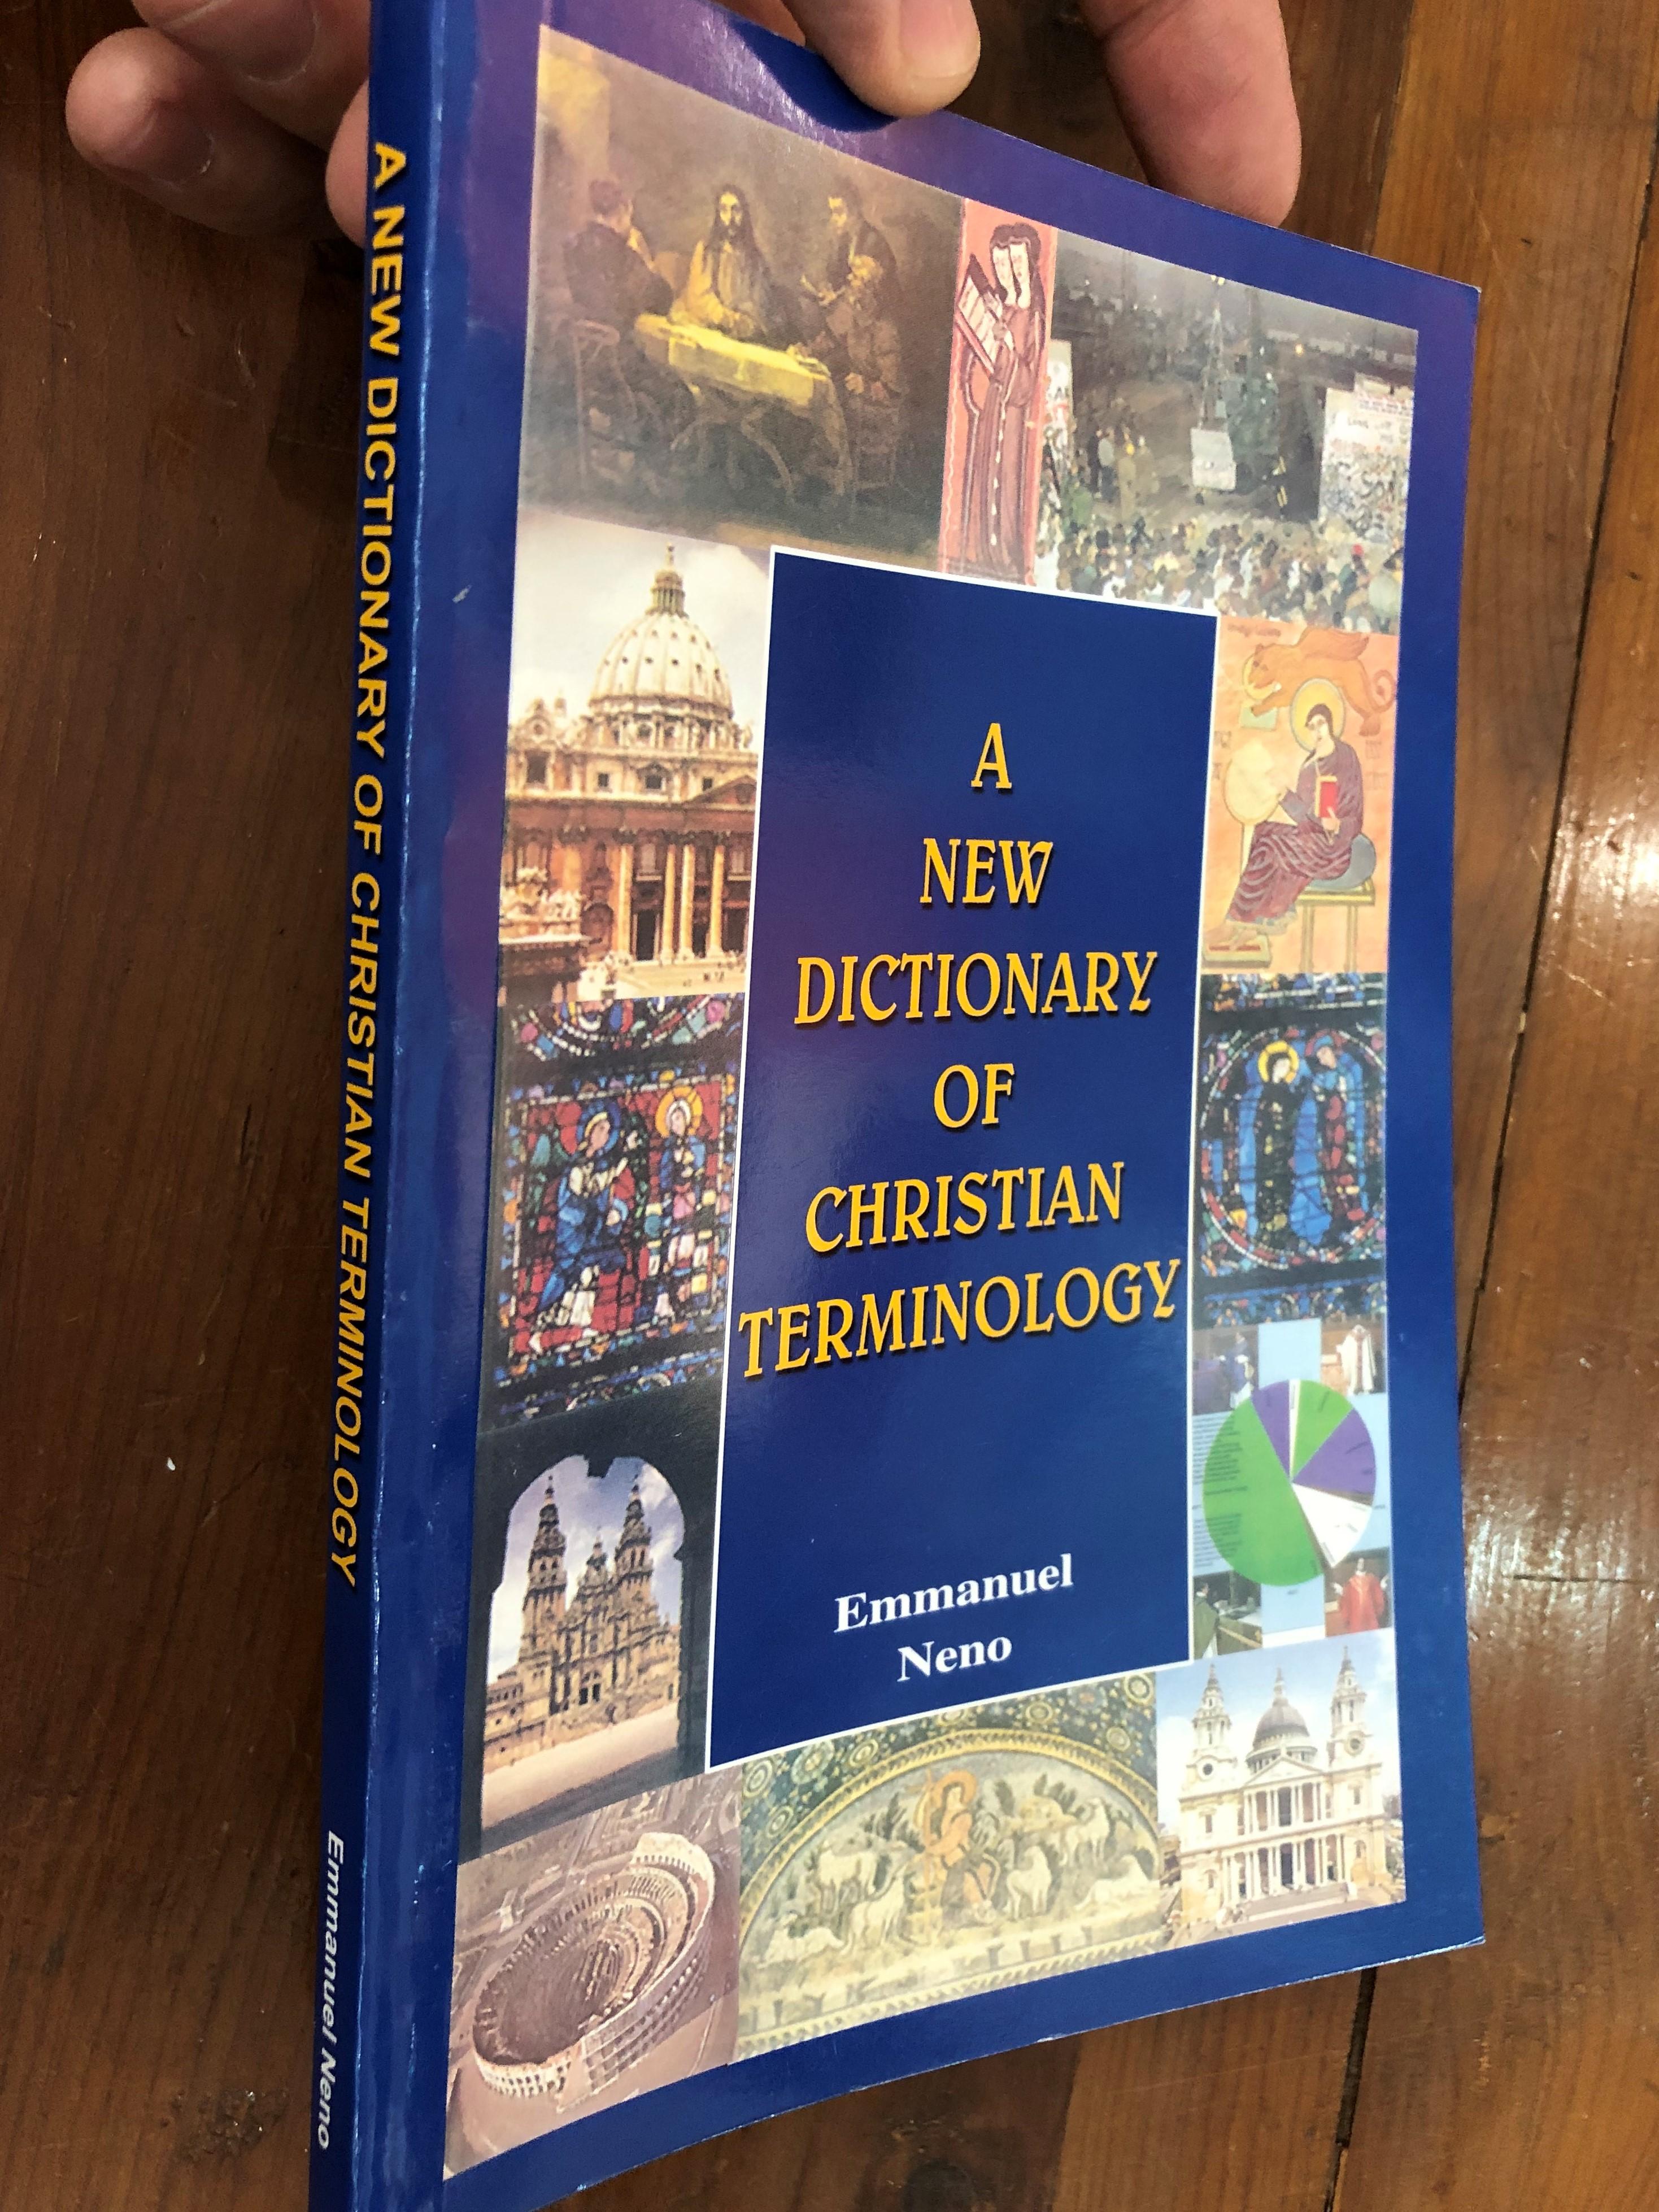 a-new-dictionary-of-christian-terminology-by-emmanuel-neno-catechetical-centre-karachi-2009-2-.jpg